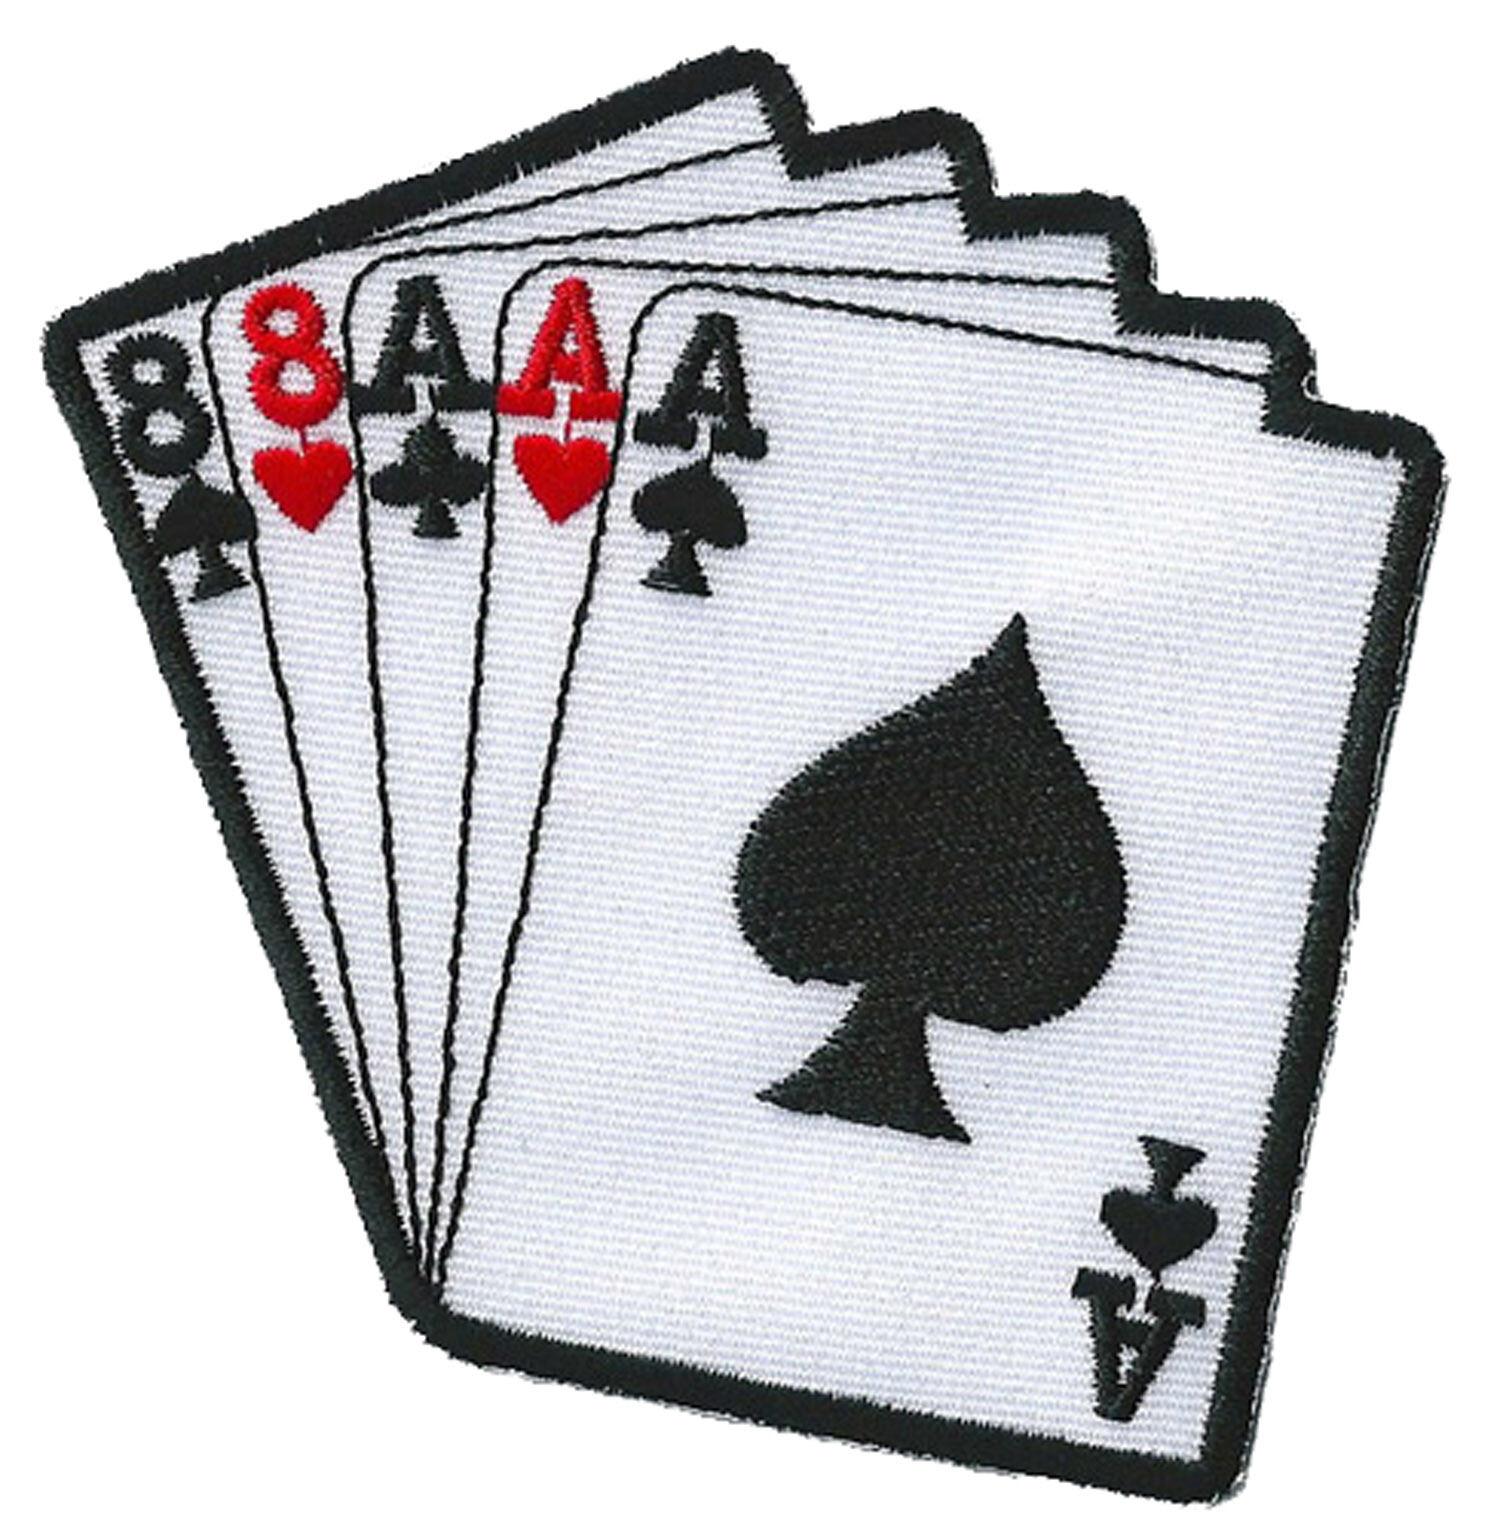 Ecusson patche thermocollant Poker Full patch casino badge brodé brodé brodé 1f8c27